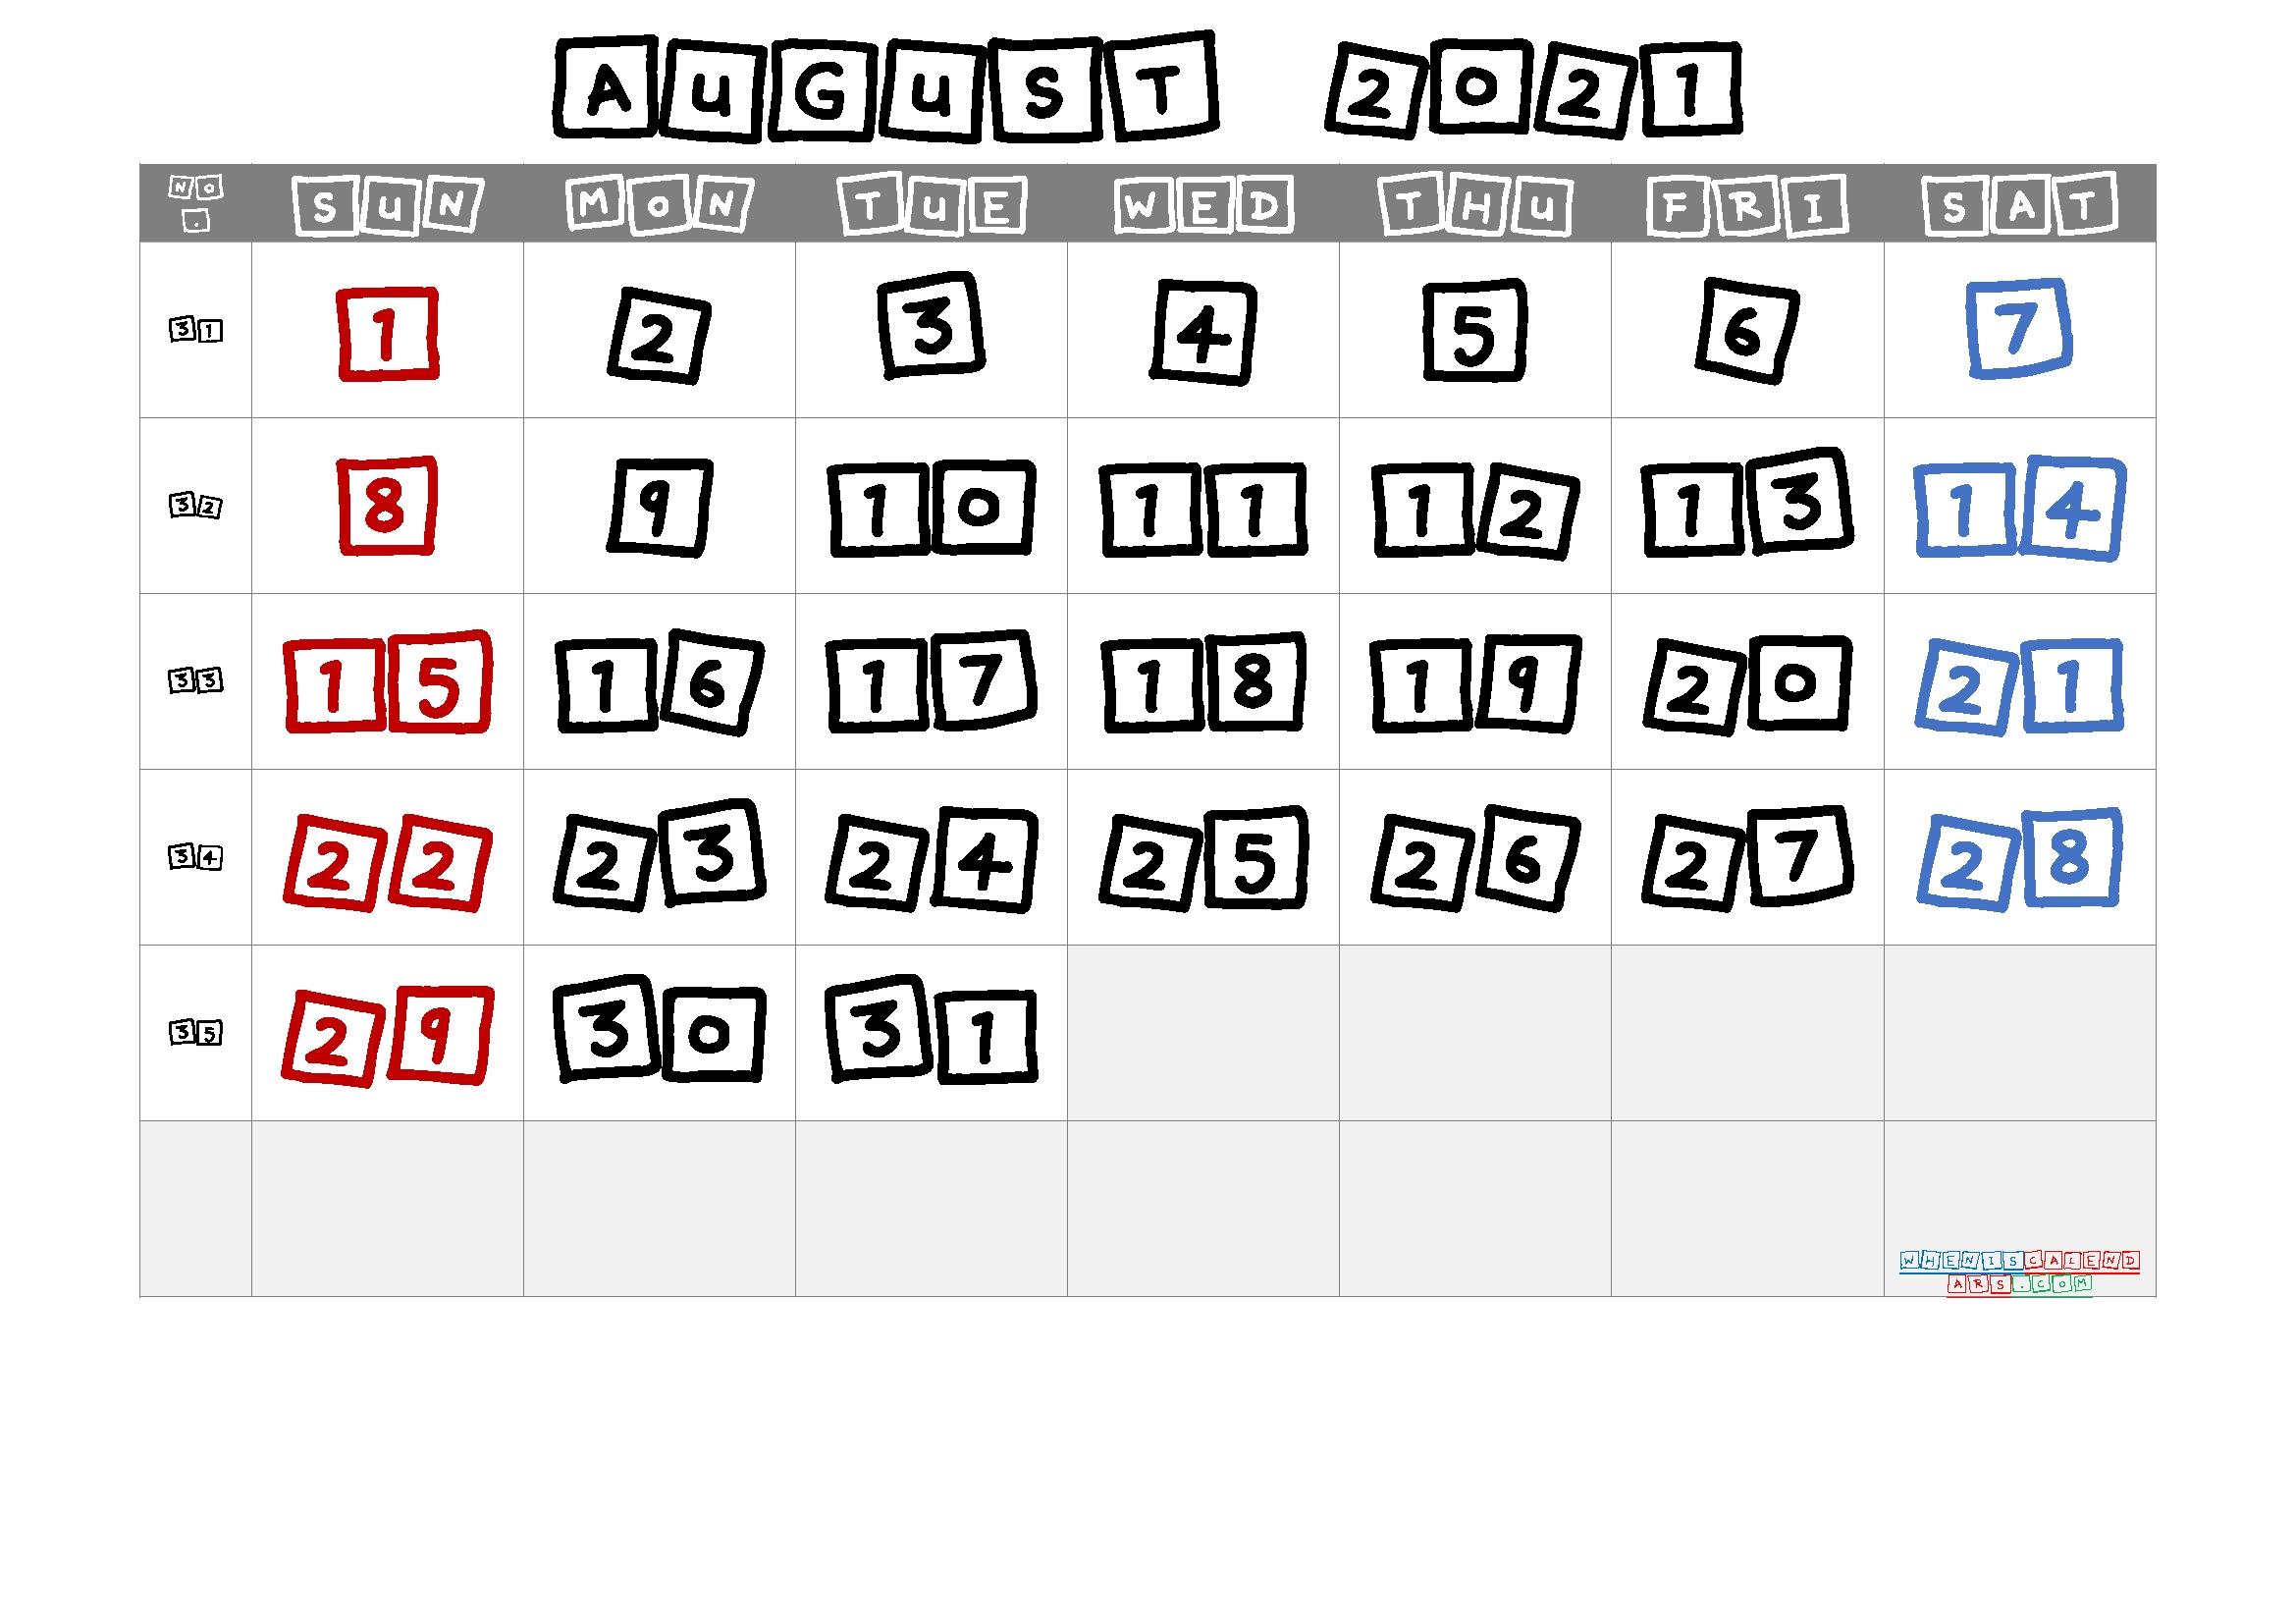 20+ August 2021 Calendar - Free Download Printable Calendar Templates ️ Calendar August 2020 To May 2021